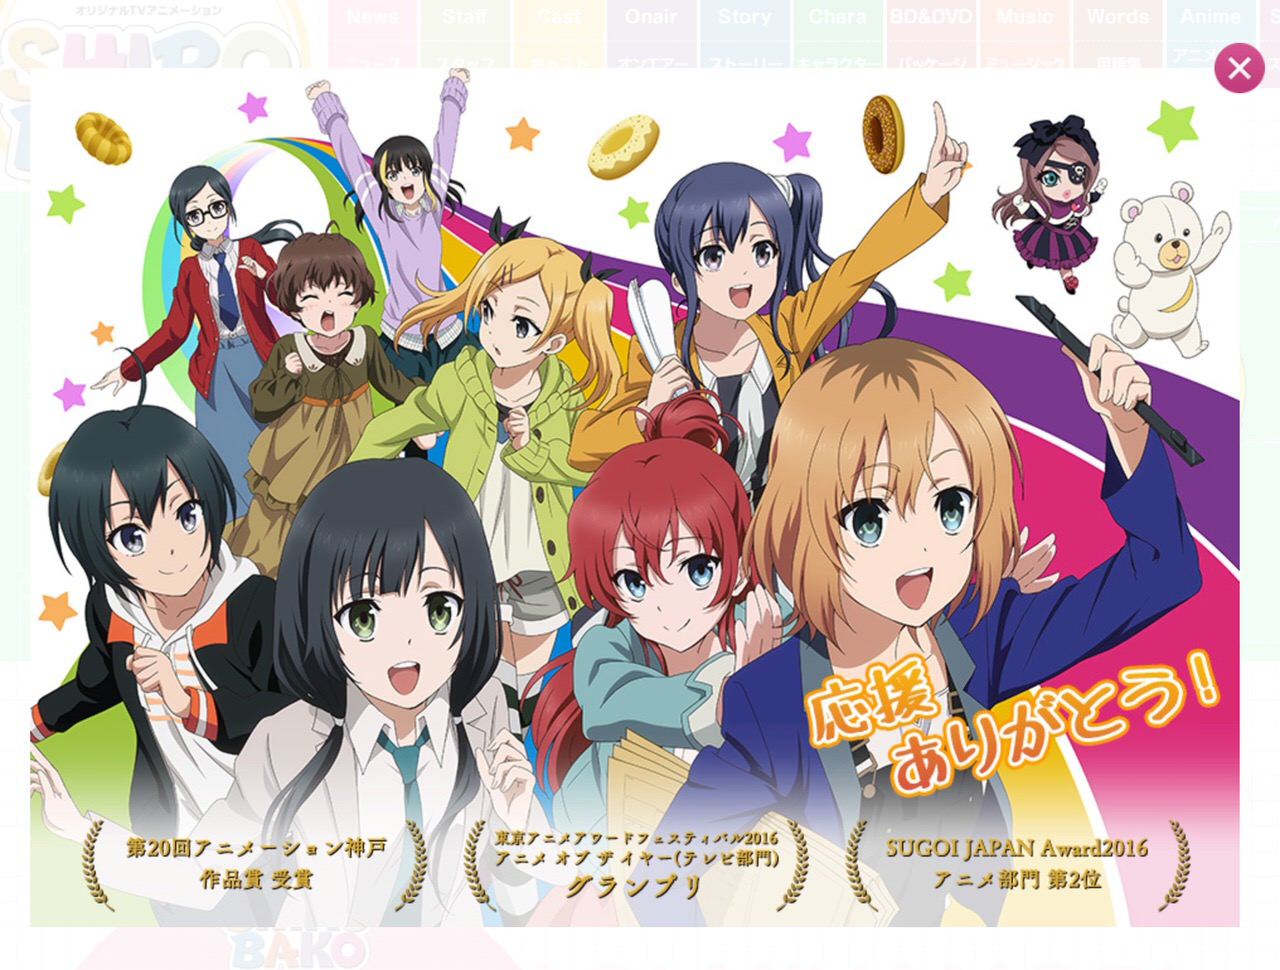 「SHIROBAKO」大量のアニメを見る前に見ておきたいアニメ制作現場の群像劇アニメ(ネタバレ)